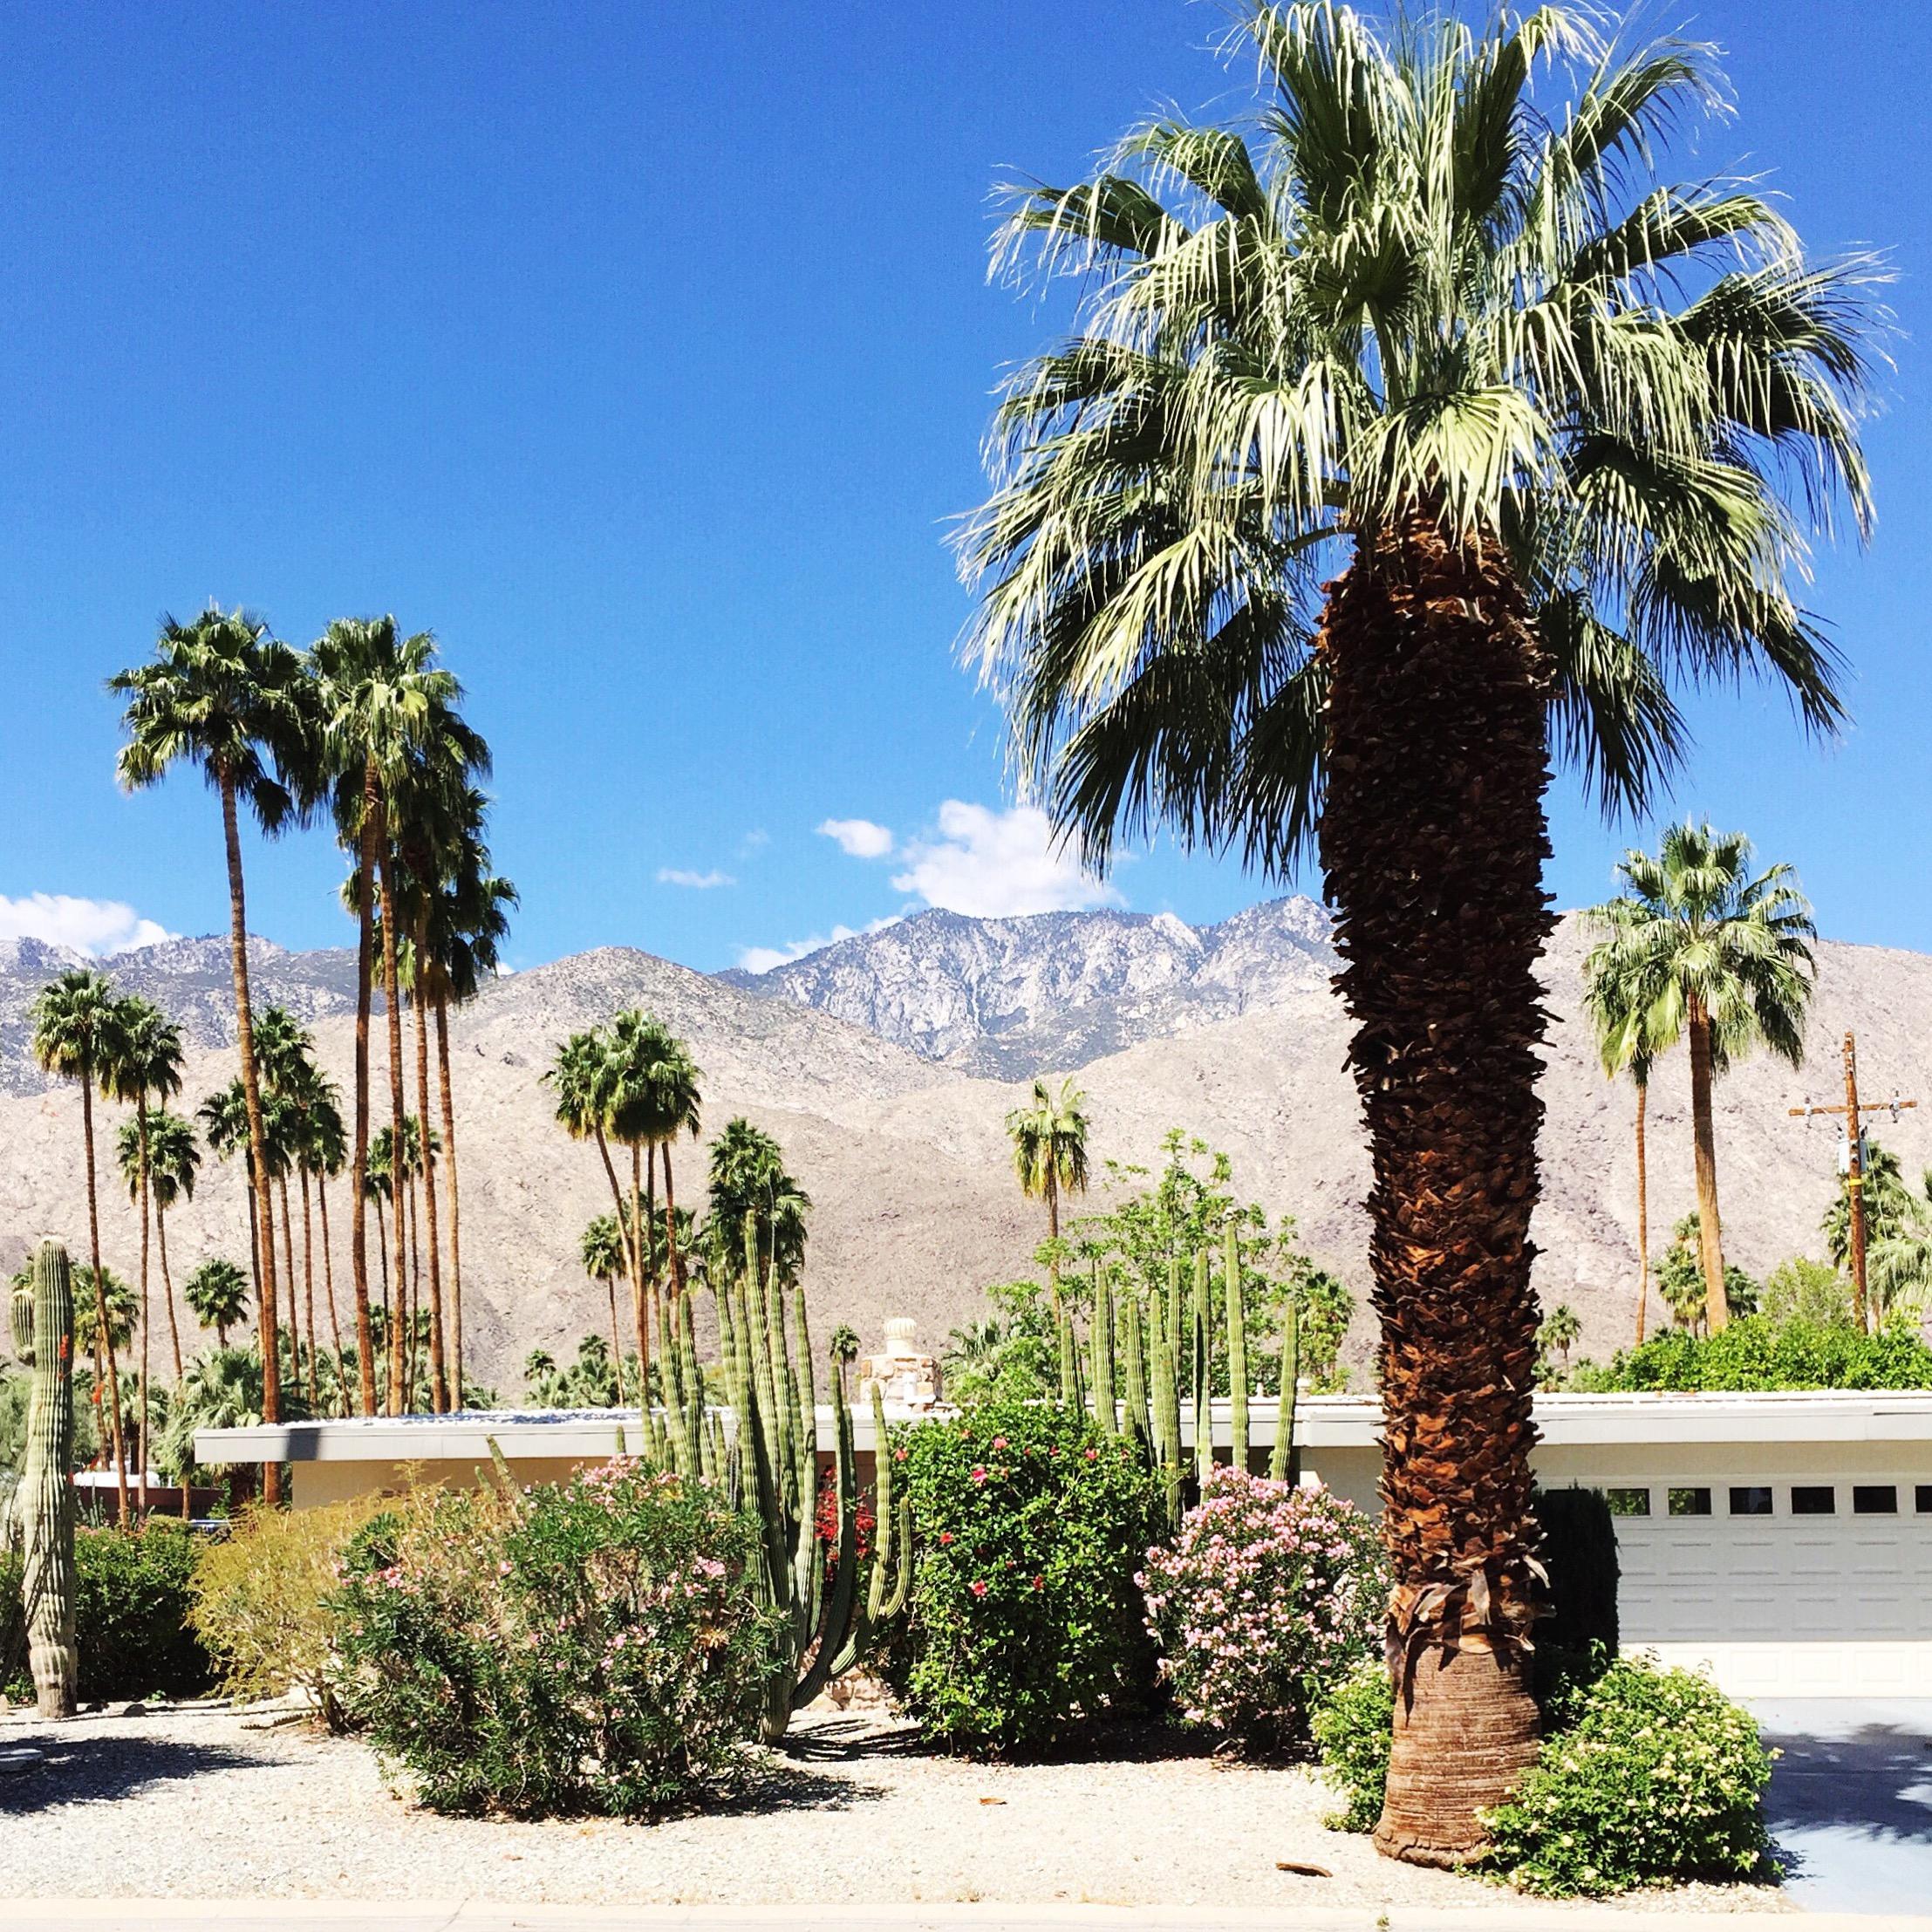 Marabou Design Palm Springs 2016